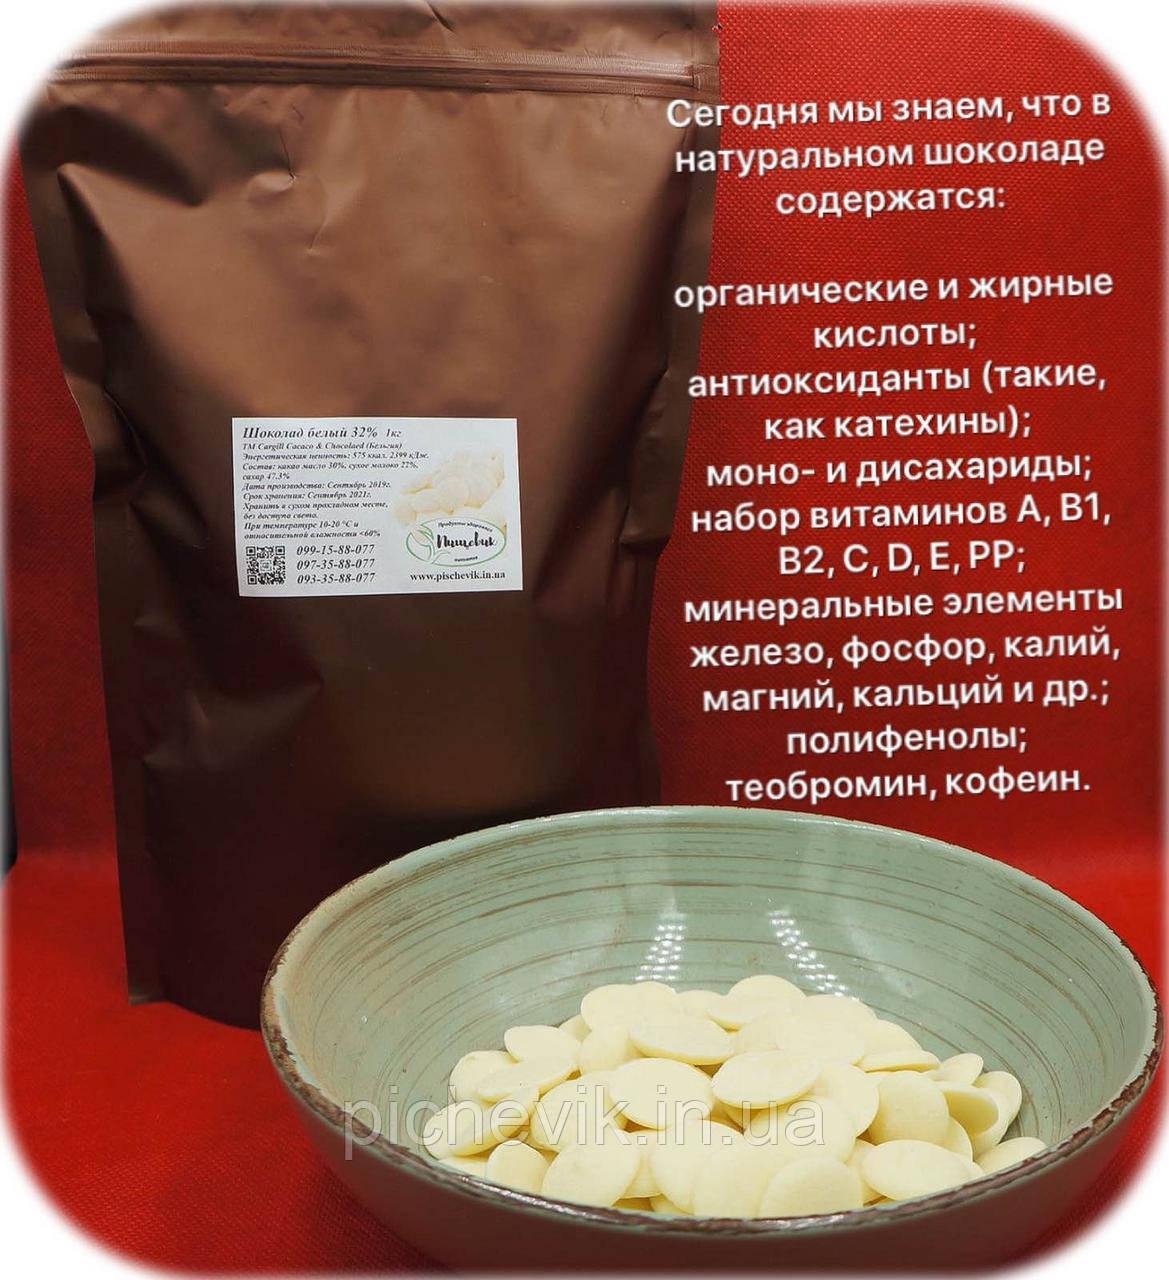 Білий шоколад 32% ТМ Сargill Cacaco & Chocolaed (Бельгія) Вага: 1 кг